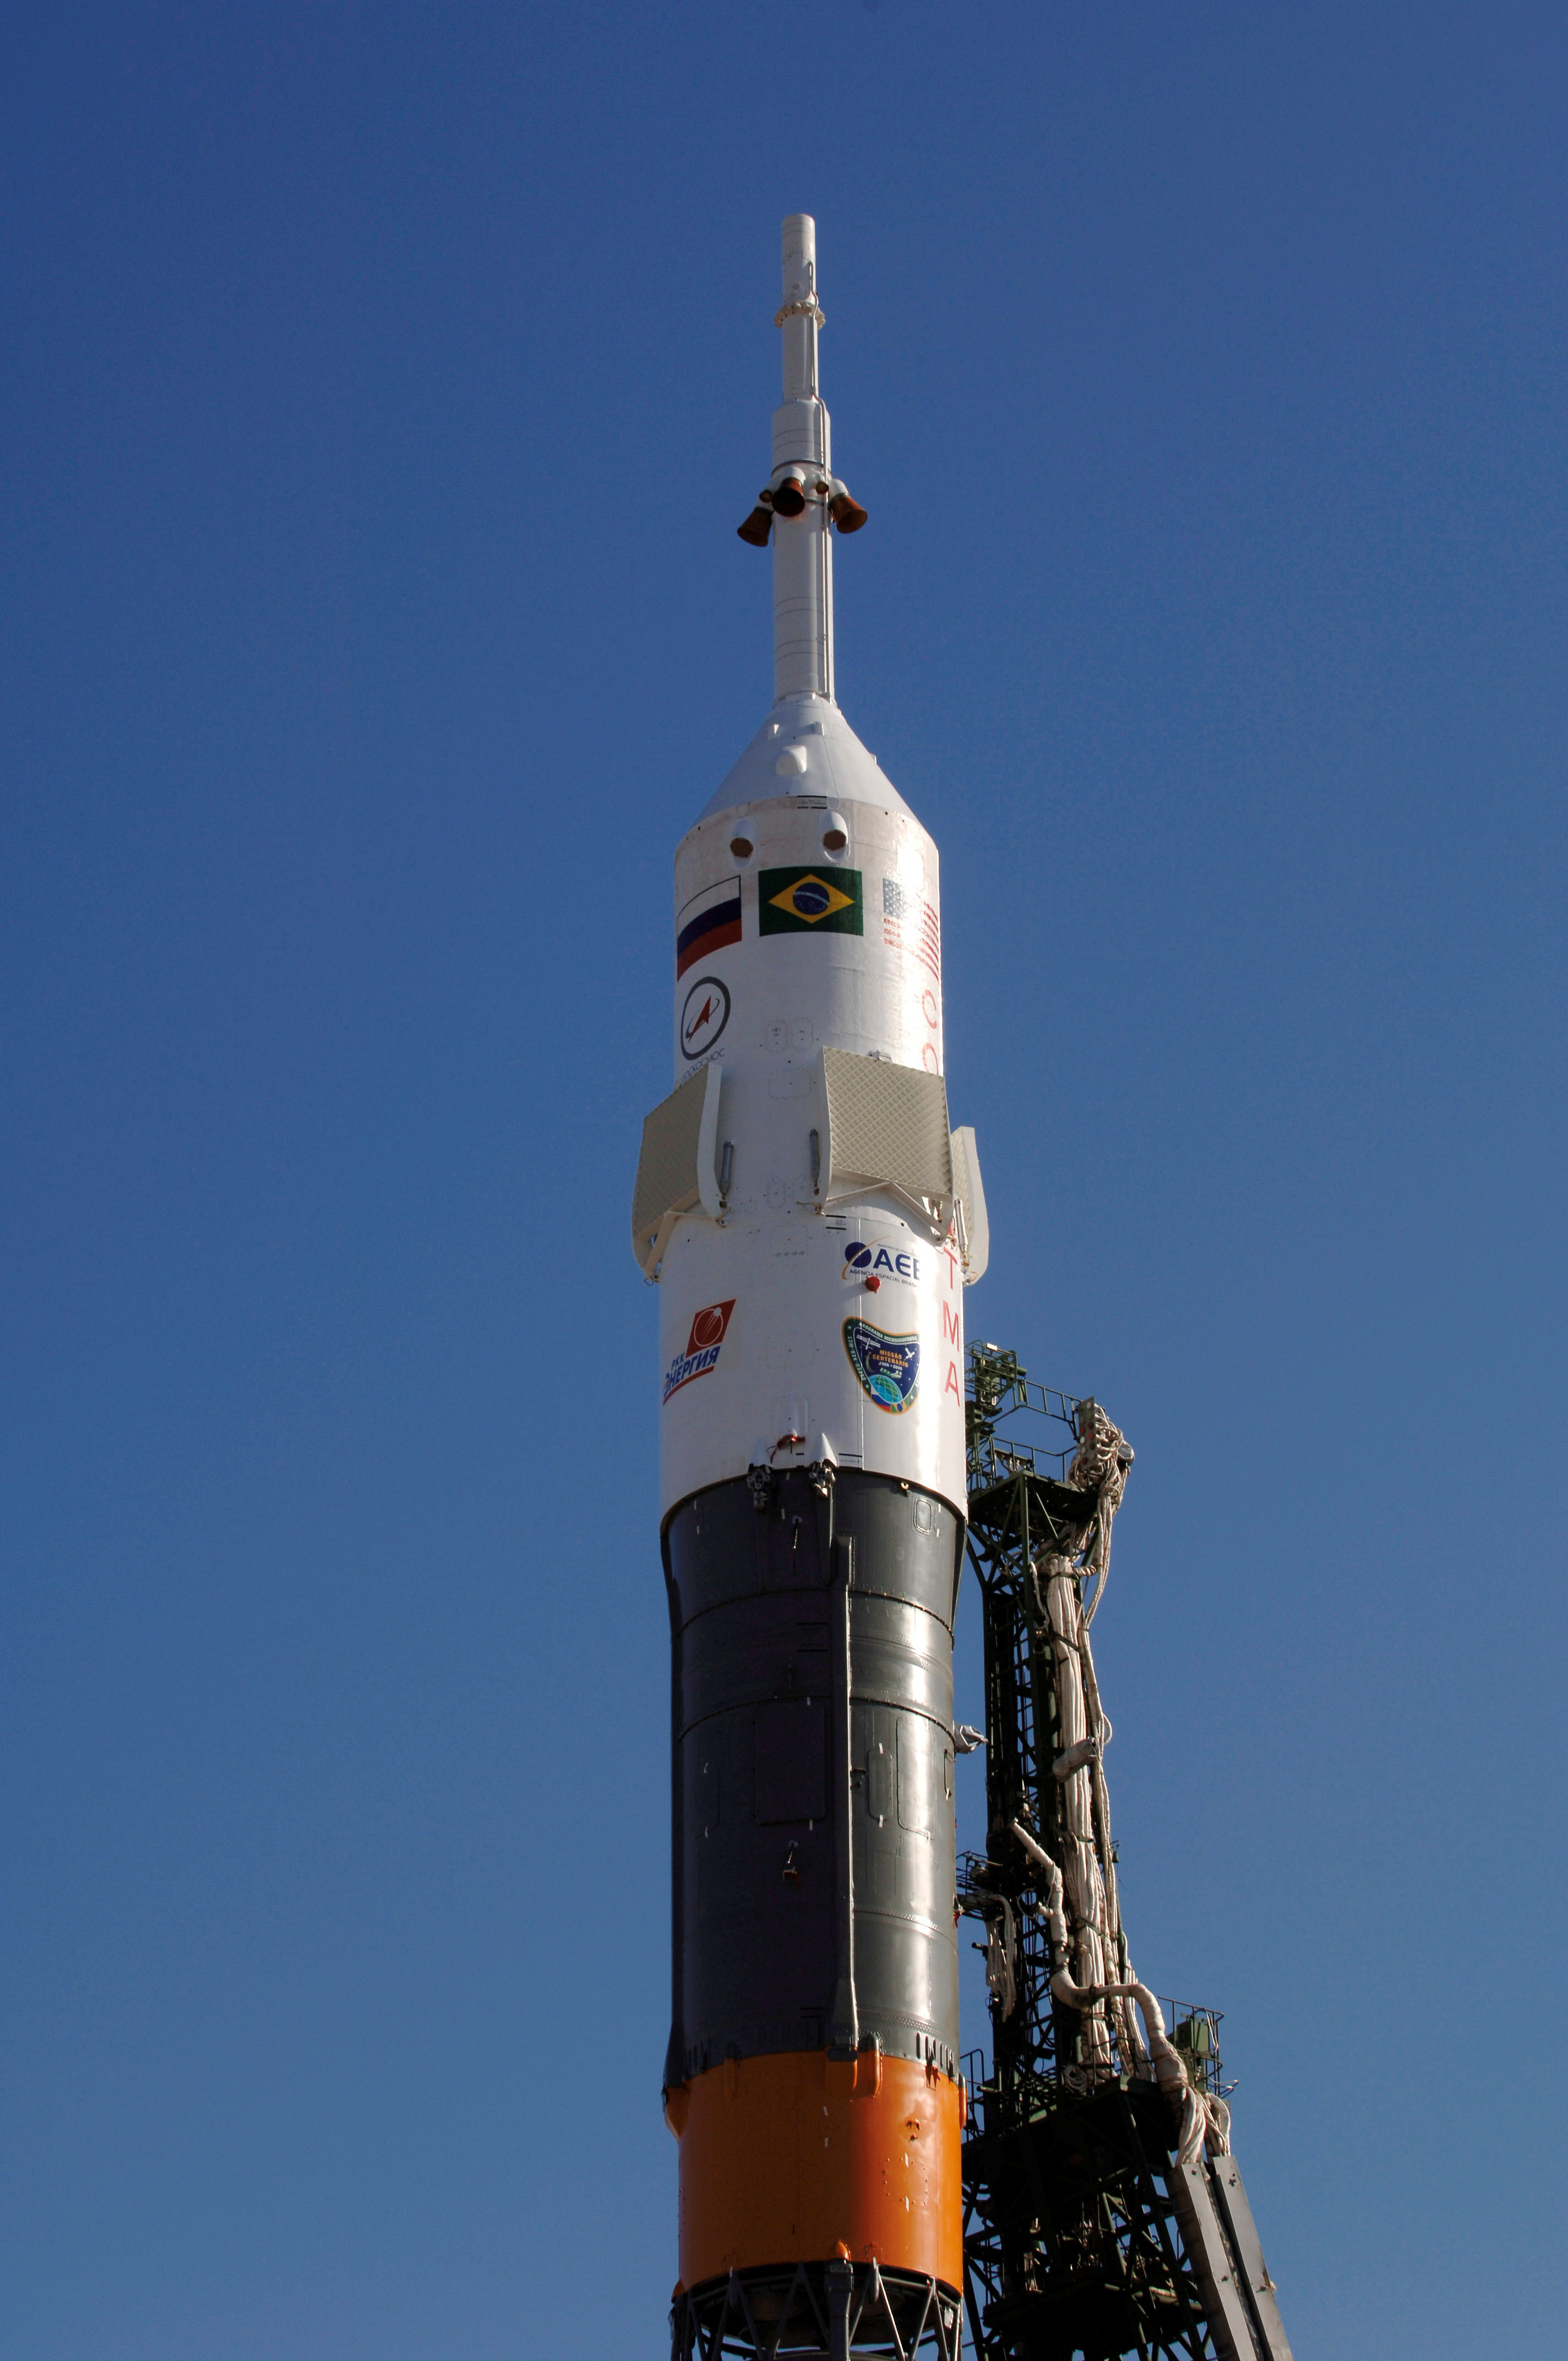 Image of the Soyuz TMA.